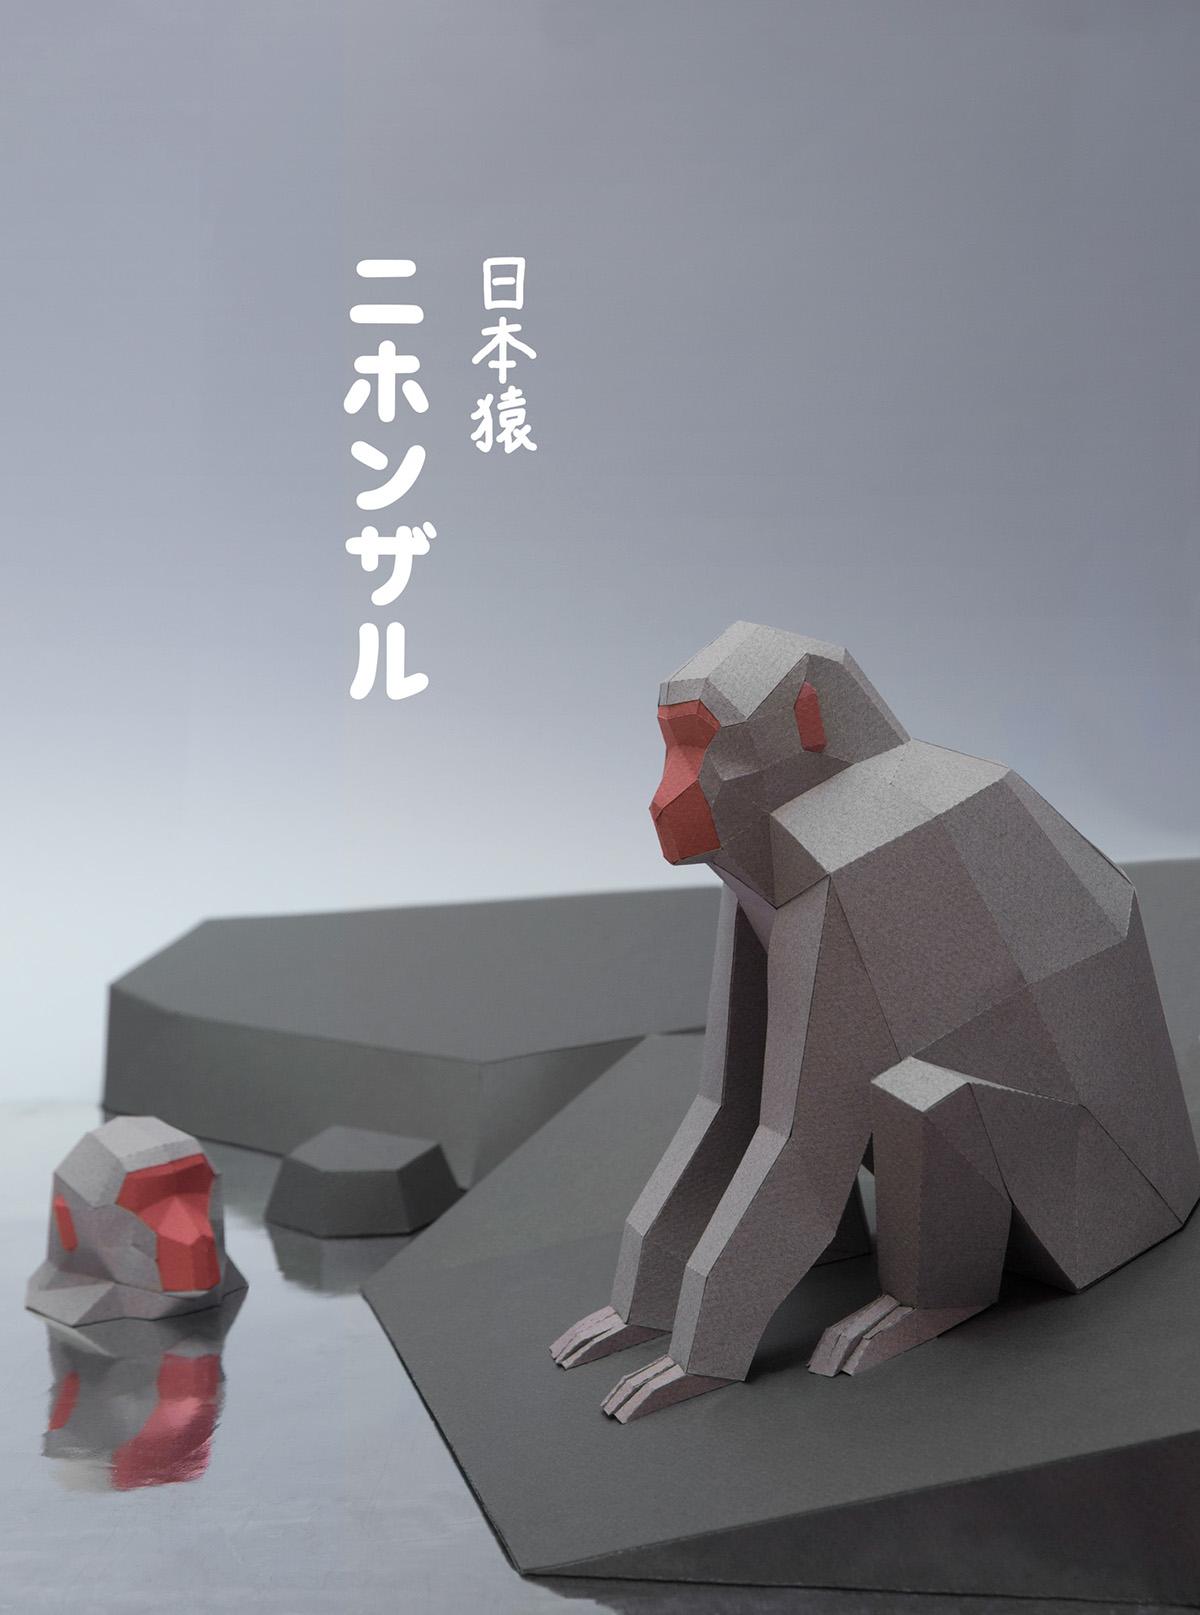 papercraft japanese macaque snow monkey macaco japonés JAPON japan Termas 日本猿